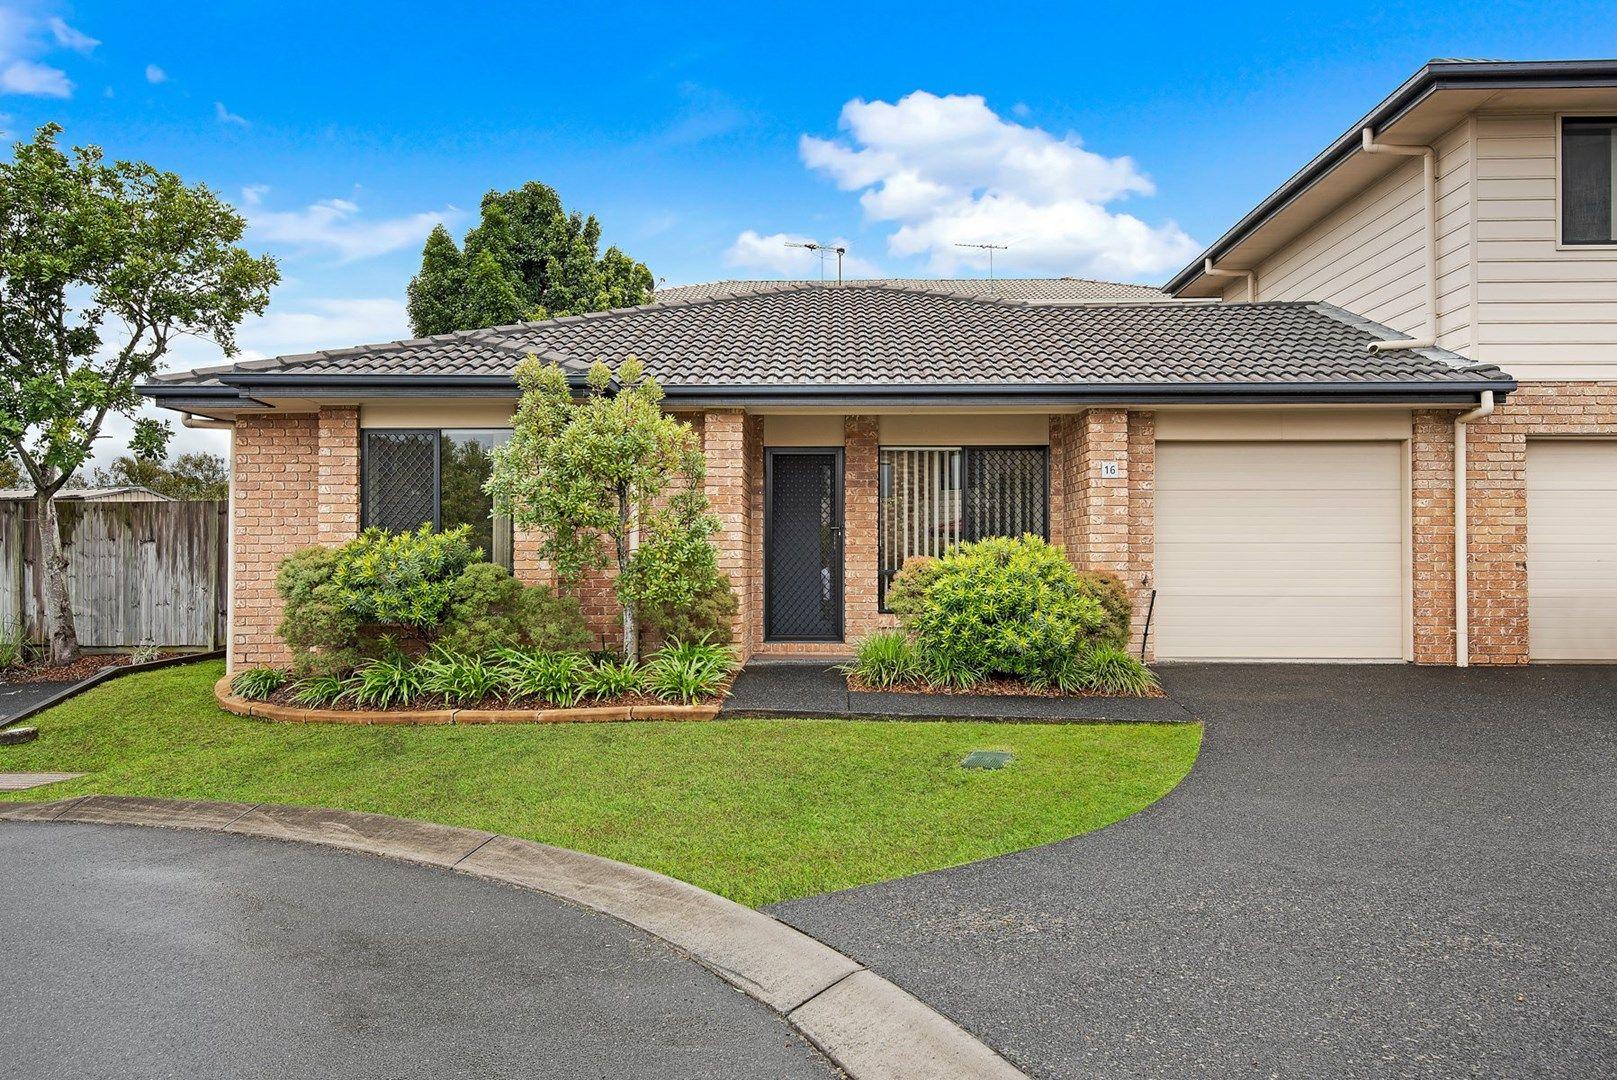 16/23 Barwon Street, Murrumba Downs QLD 4503, Image 0